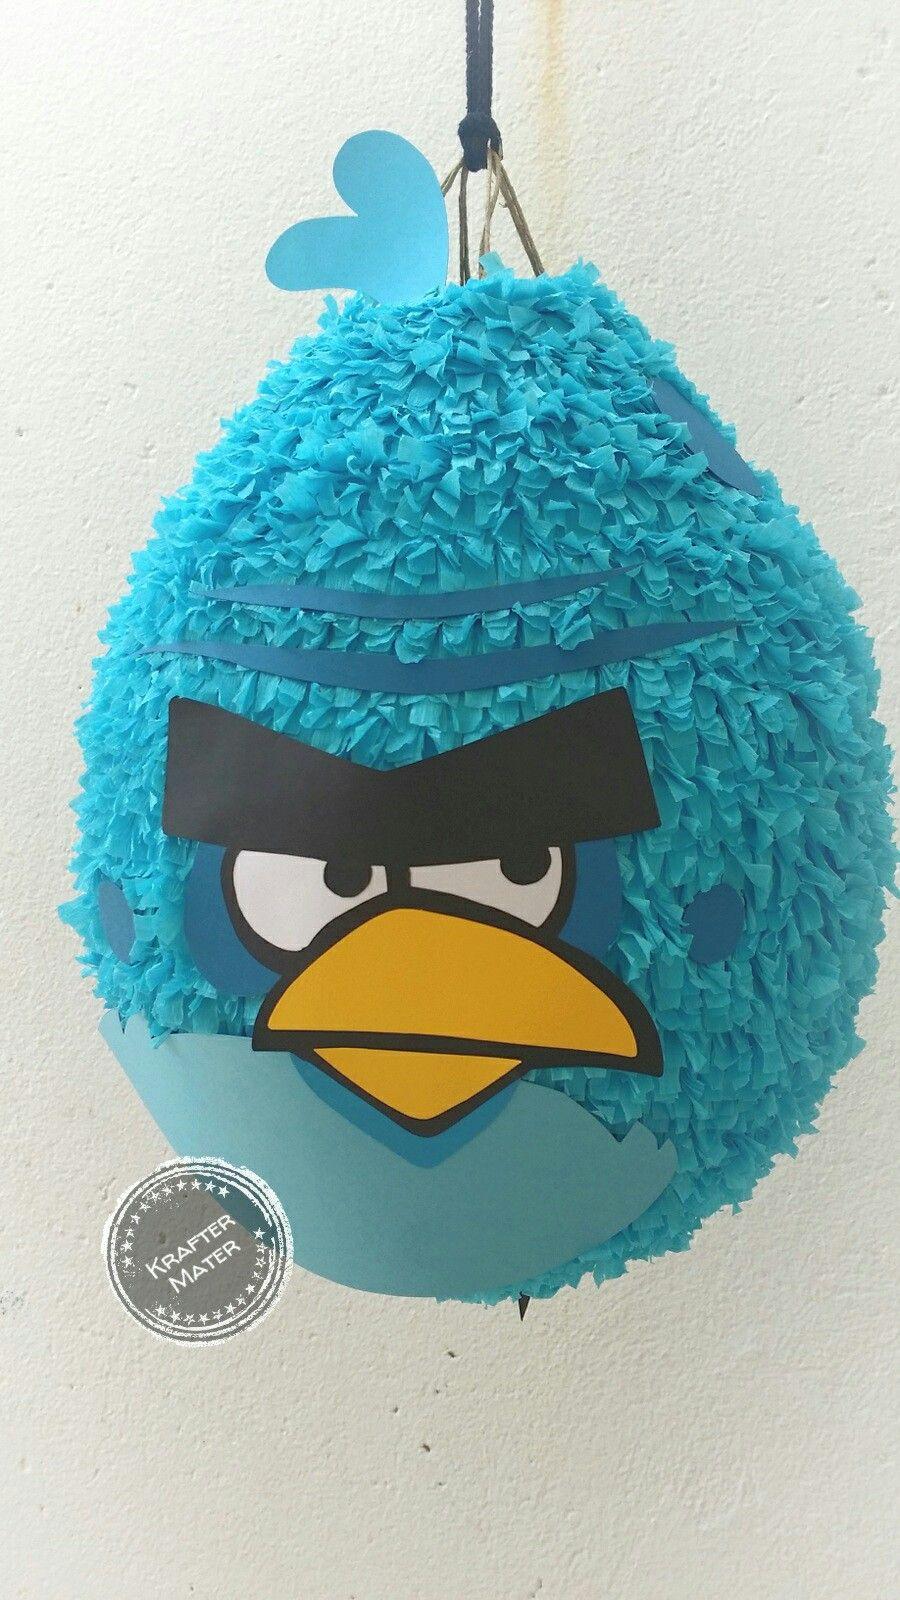 piñata angrybird blue birthday party Animal party